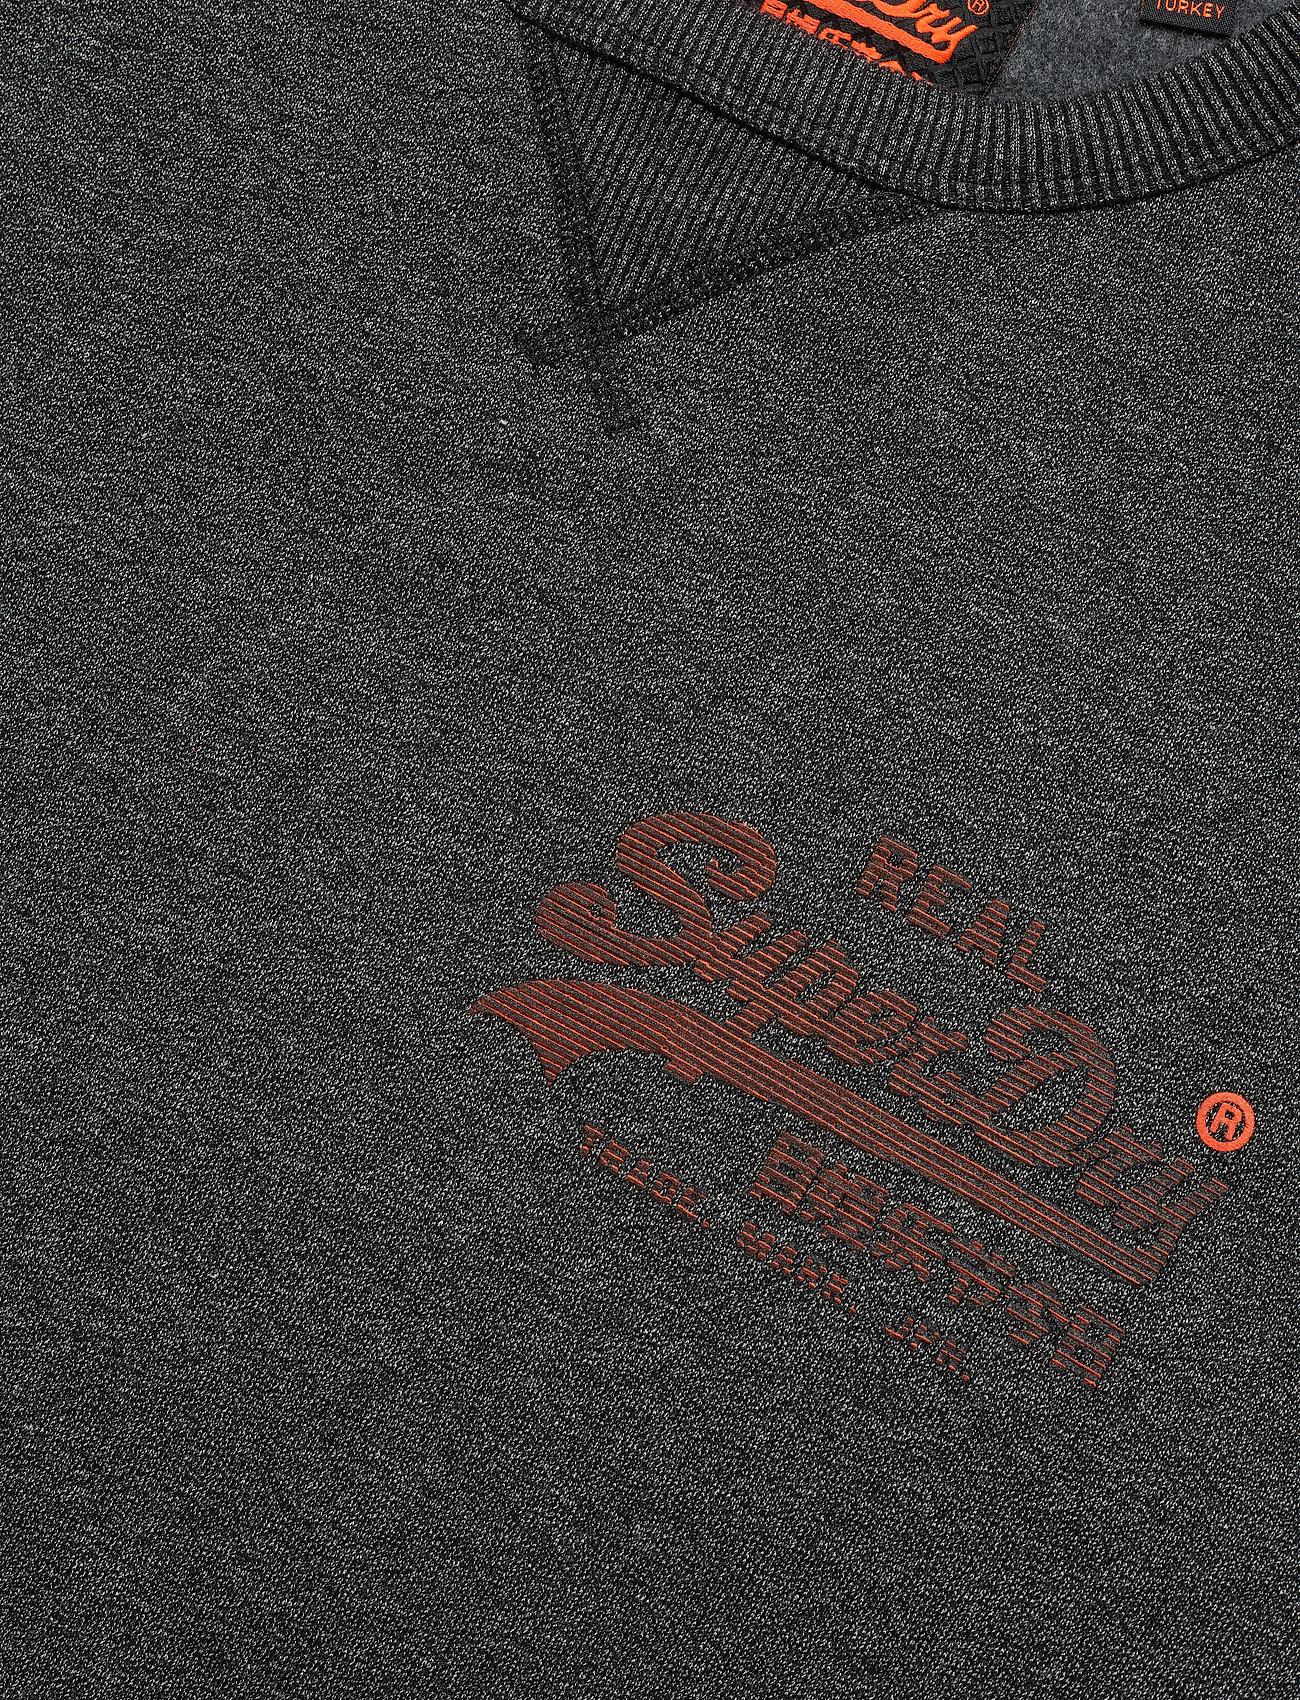 Vintage Logo Monochrome GritSuperdry Monochrome GritSuperdry Crewblack Crewblack Logo Vintage J31cTlKF